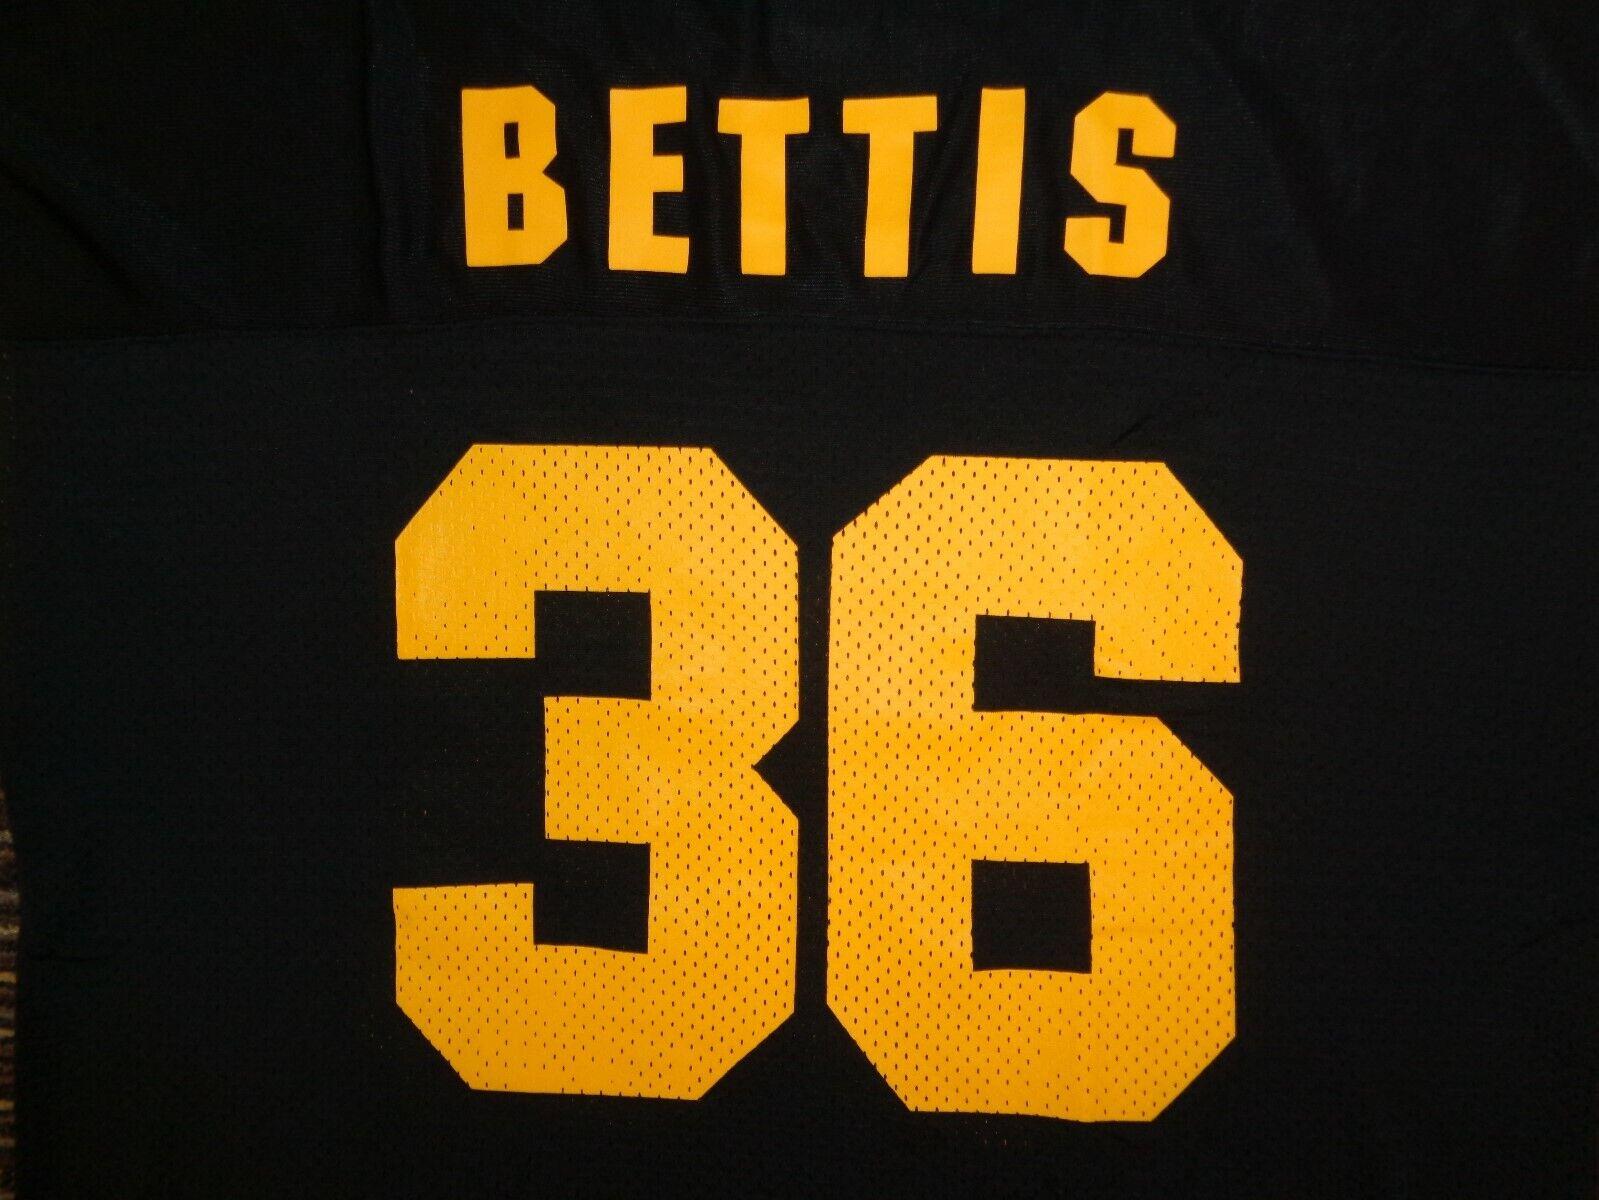 JEROME BETTIS 36 ST. LOUIS LA LOS ANGELES RAMS STARTER BLACK NFL GAME JERSEY  - $199.99